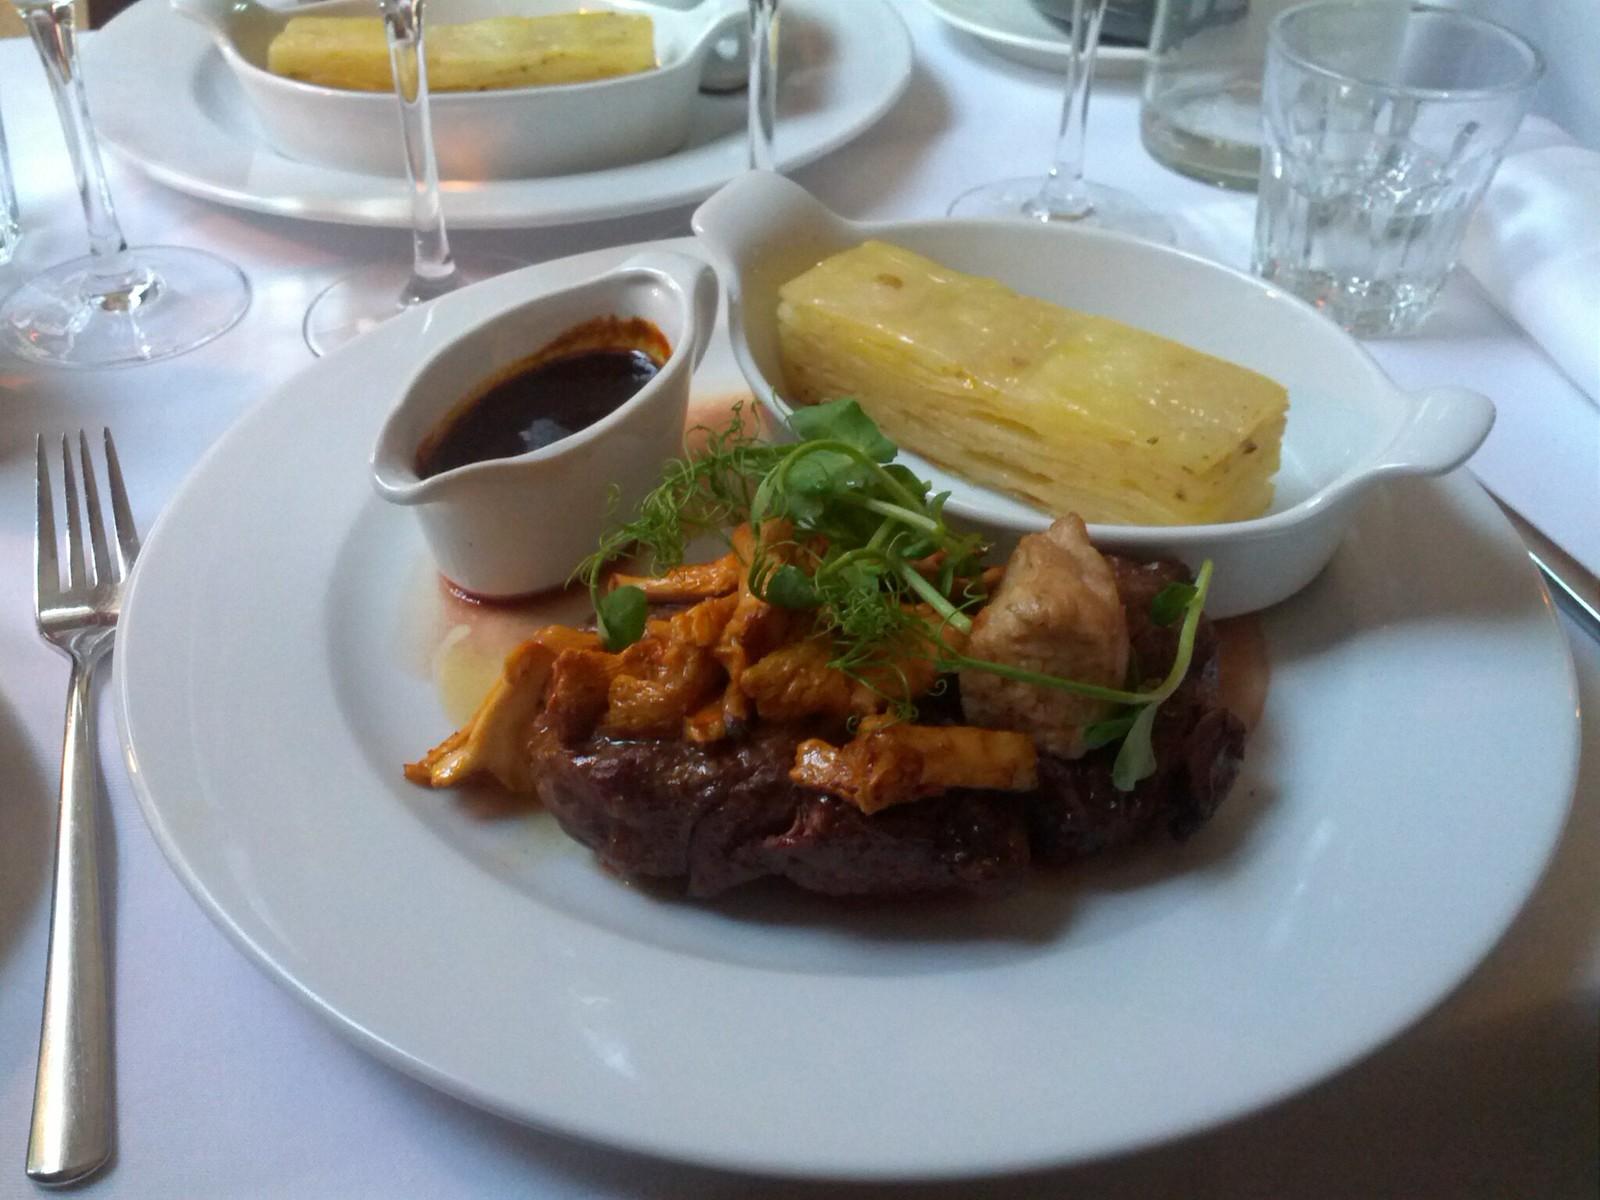 Australske kornfodrede ribeye, serveret med pommes anna, kantareller, Smørstegt brissel samt sauce bordelaise